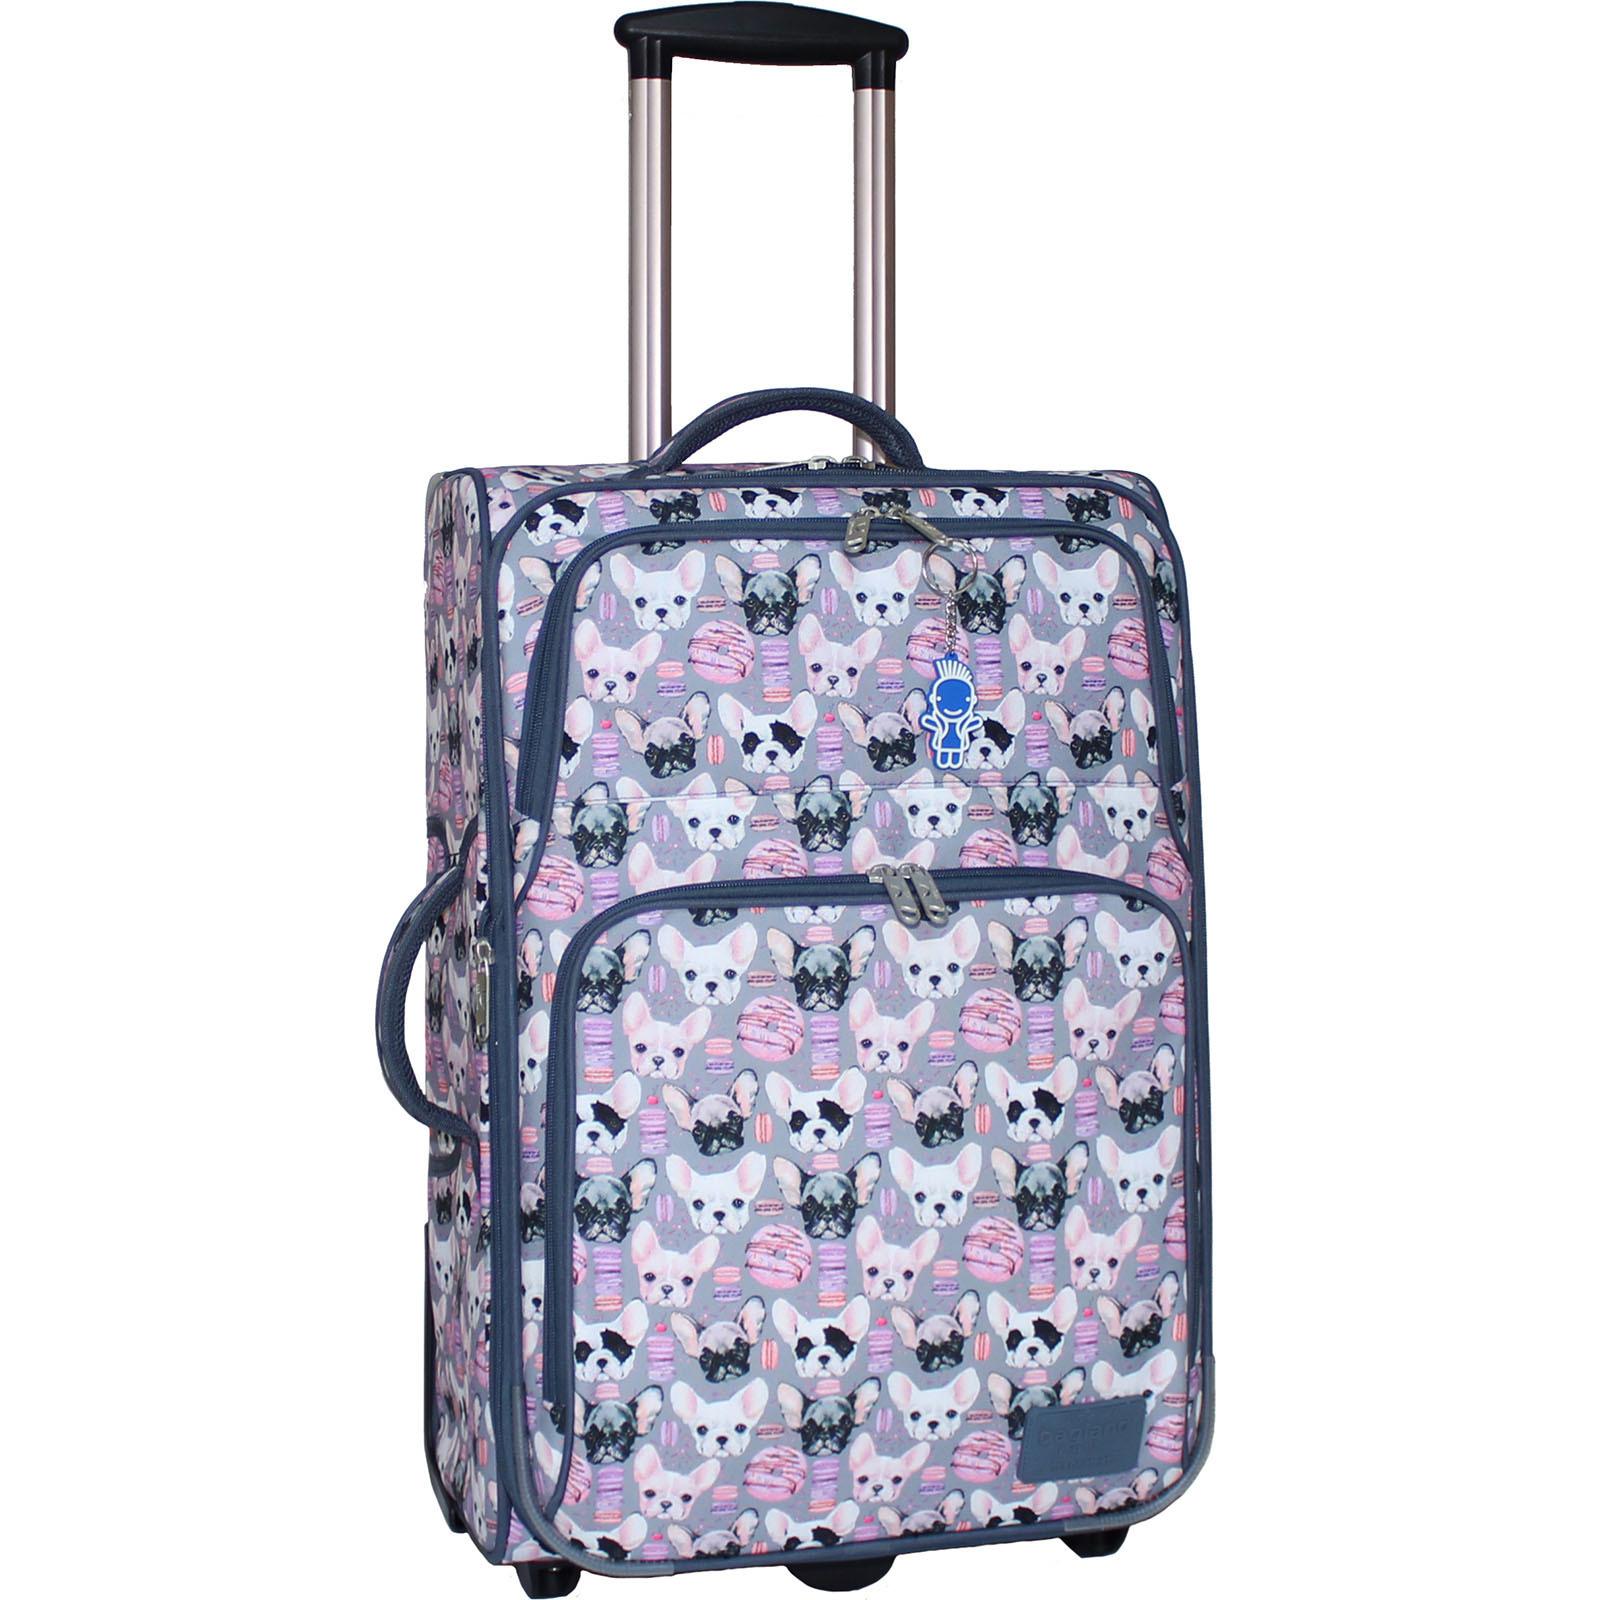 Дорожные чемоданы Чемодан Bagland Леон средний дизайн 51 л. сублімація 144 (0037666244) IMG_8418_арт144_.JPG